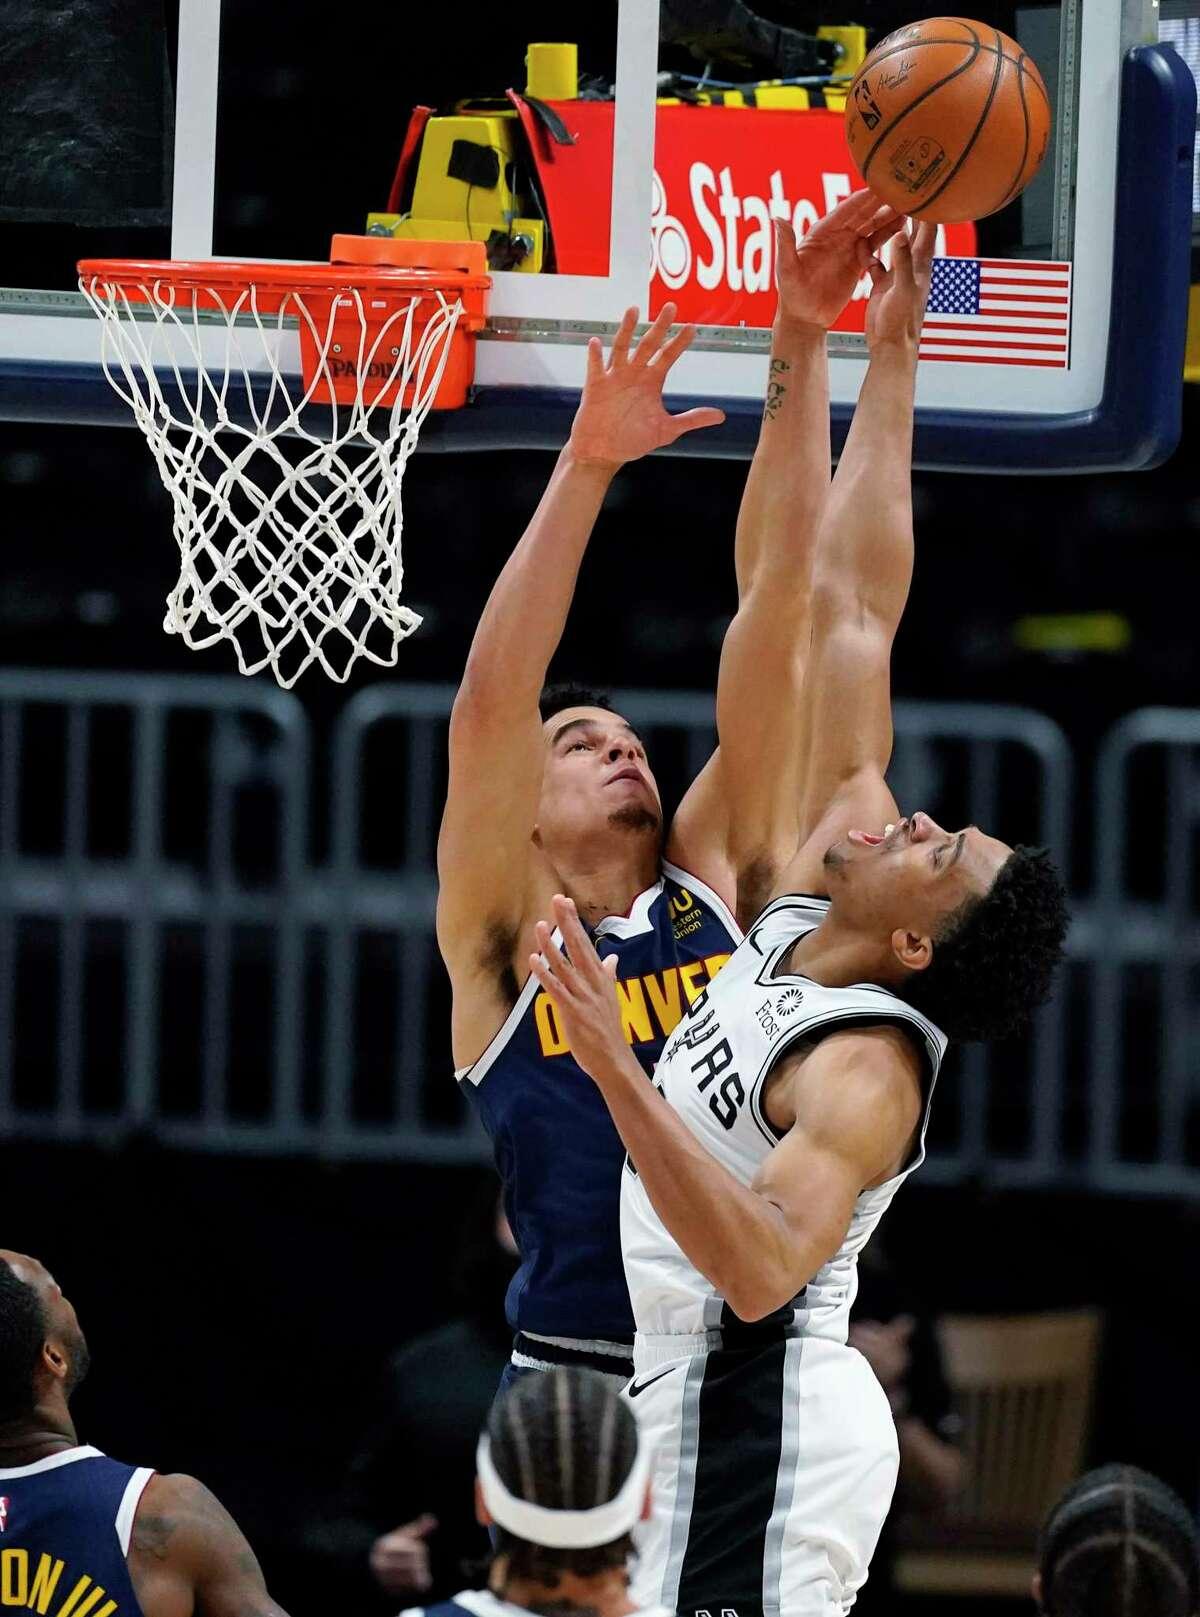 Denver Nuggets forward Michael Porter Jr., left, blocks a last-second shot by San Antonio Spurs forward Keldon Johnson in the second half of an NBA basketball game Friday, April 9, 2021, in Denver. (AP Photo/David Zalubowski)